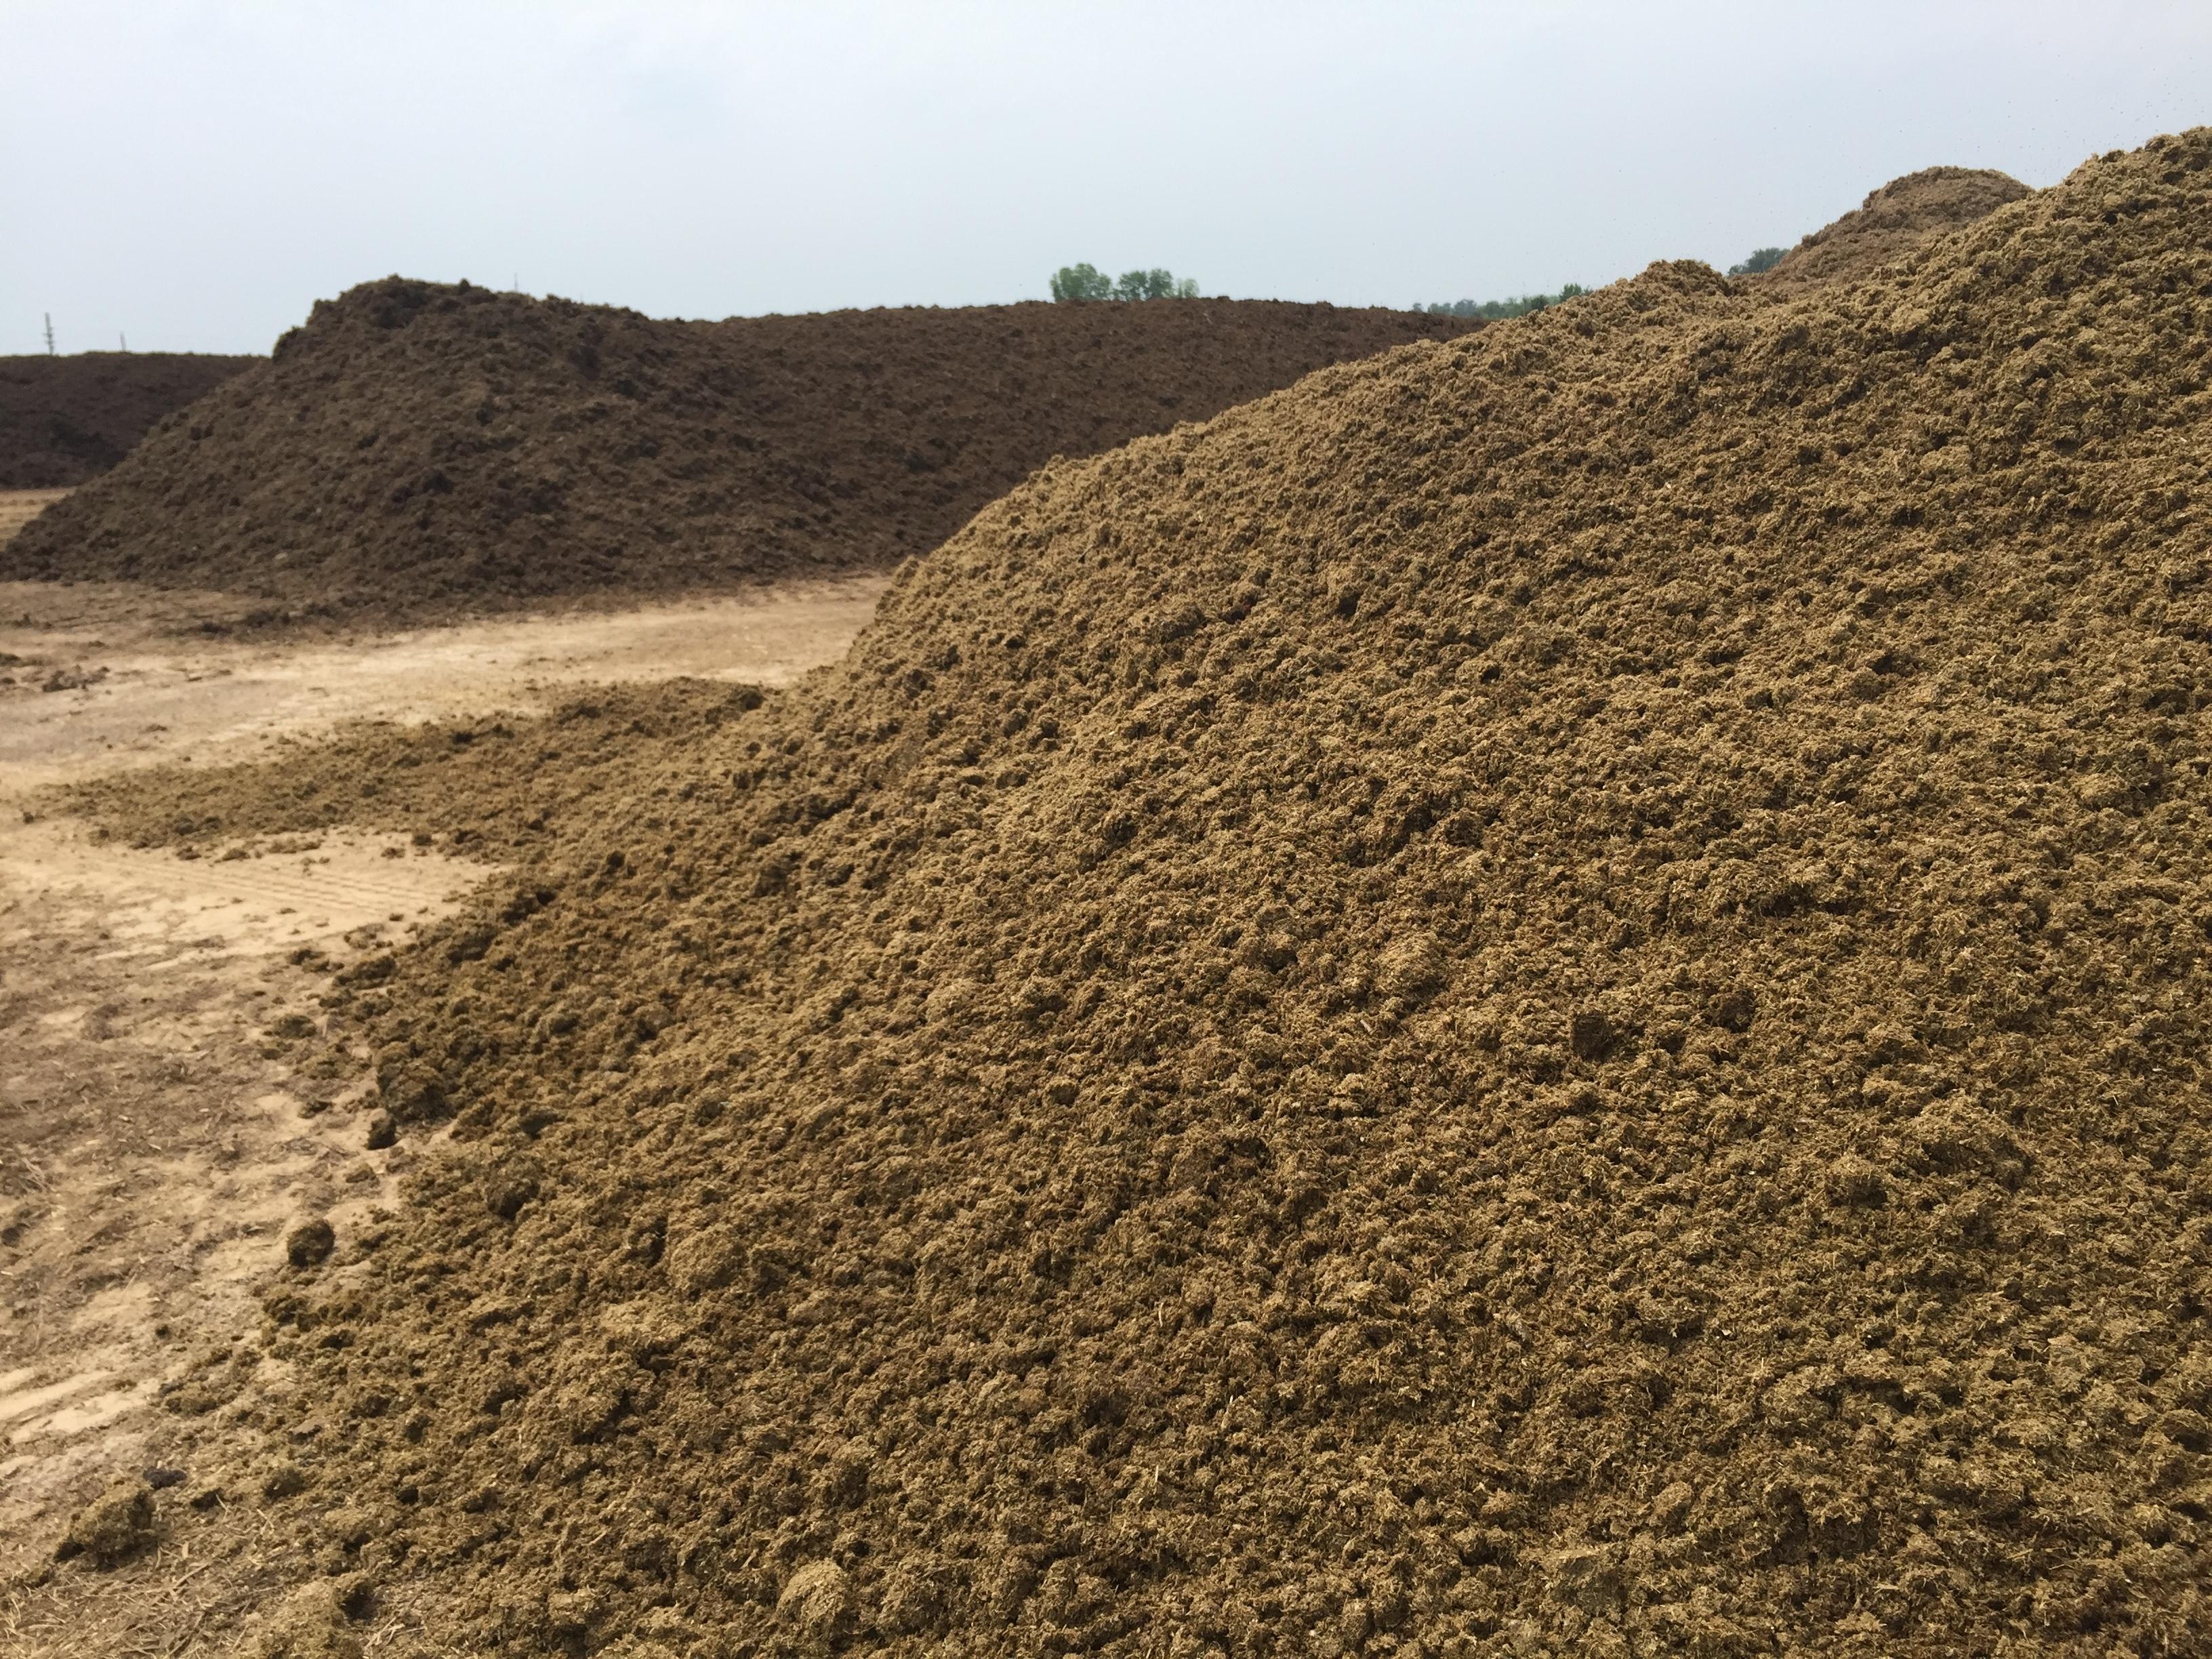 Soil3 organic compost decomposing